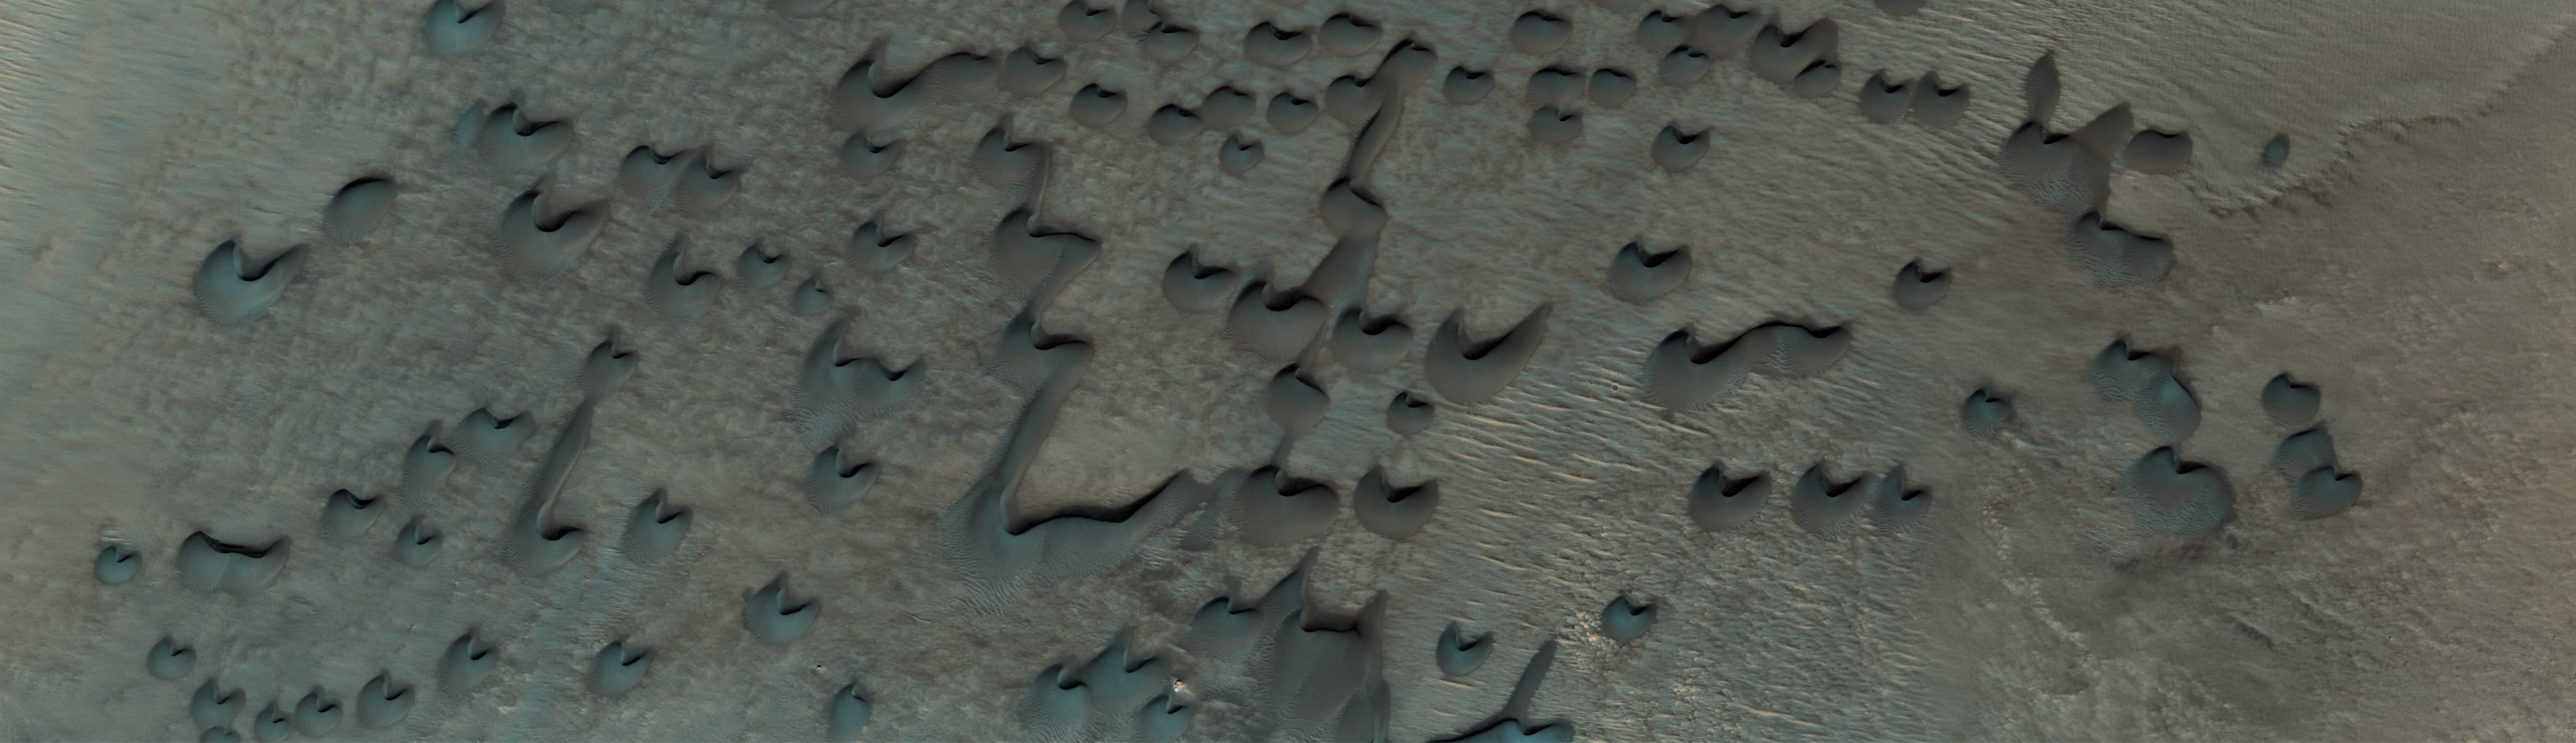 blue dune 01242018 (NASA MRO) overview 1(c)